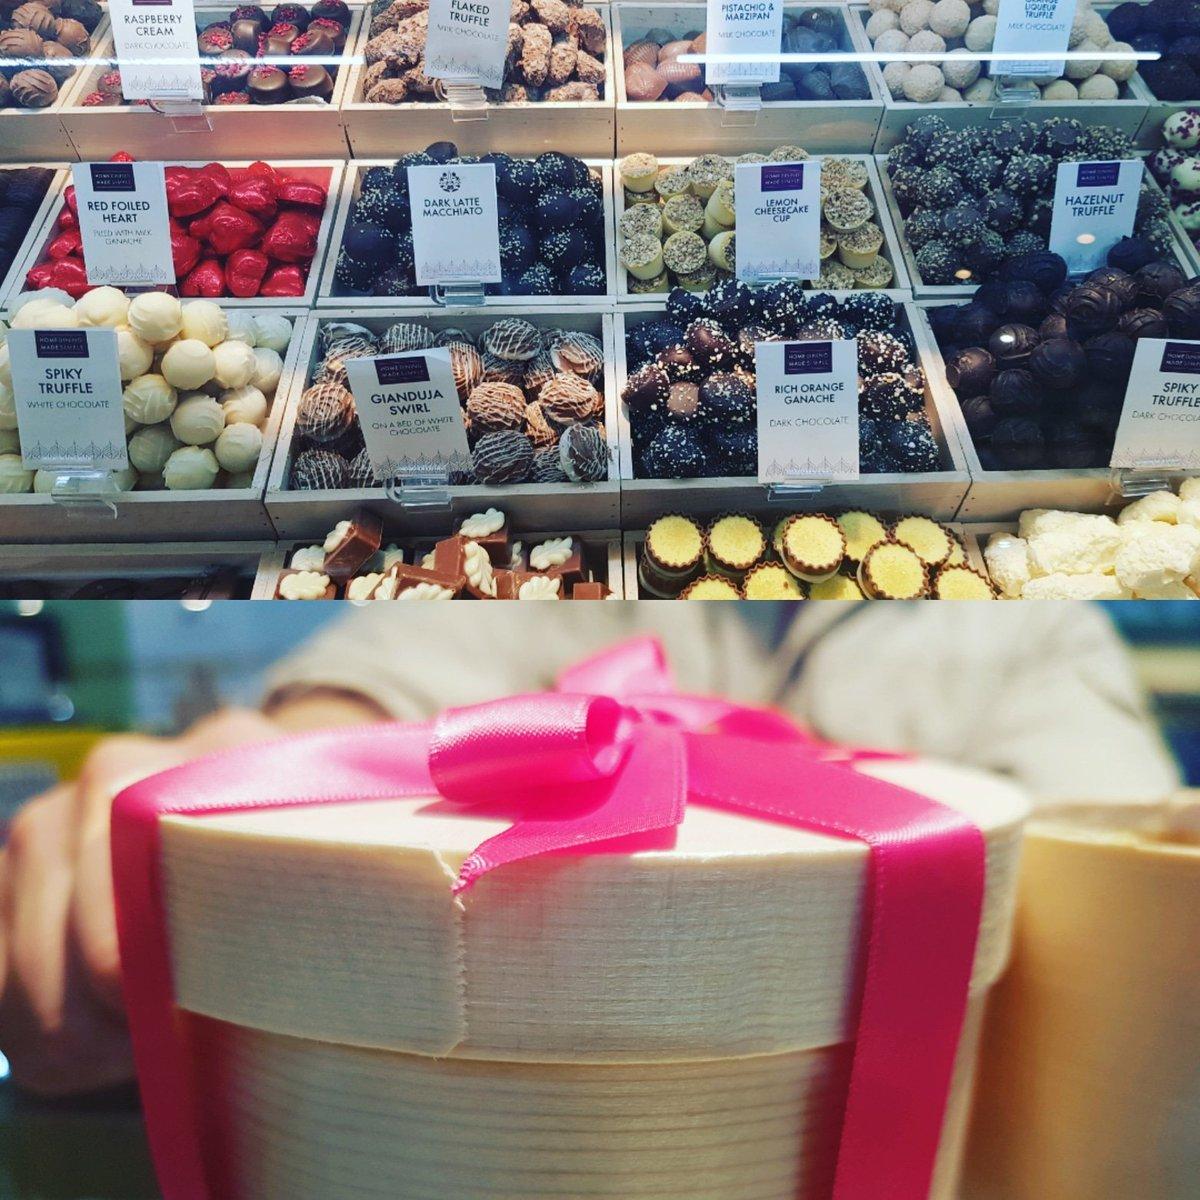 Beautiful chocolate for Easter Treats. Handmade and delicious. #handmadechoc #Easter2019 #Northampton